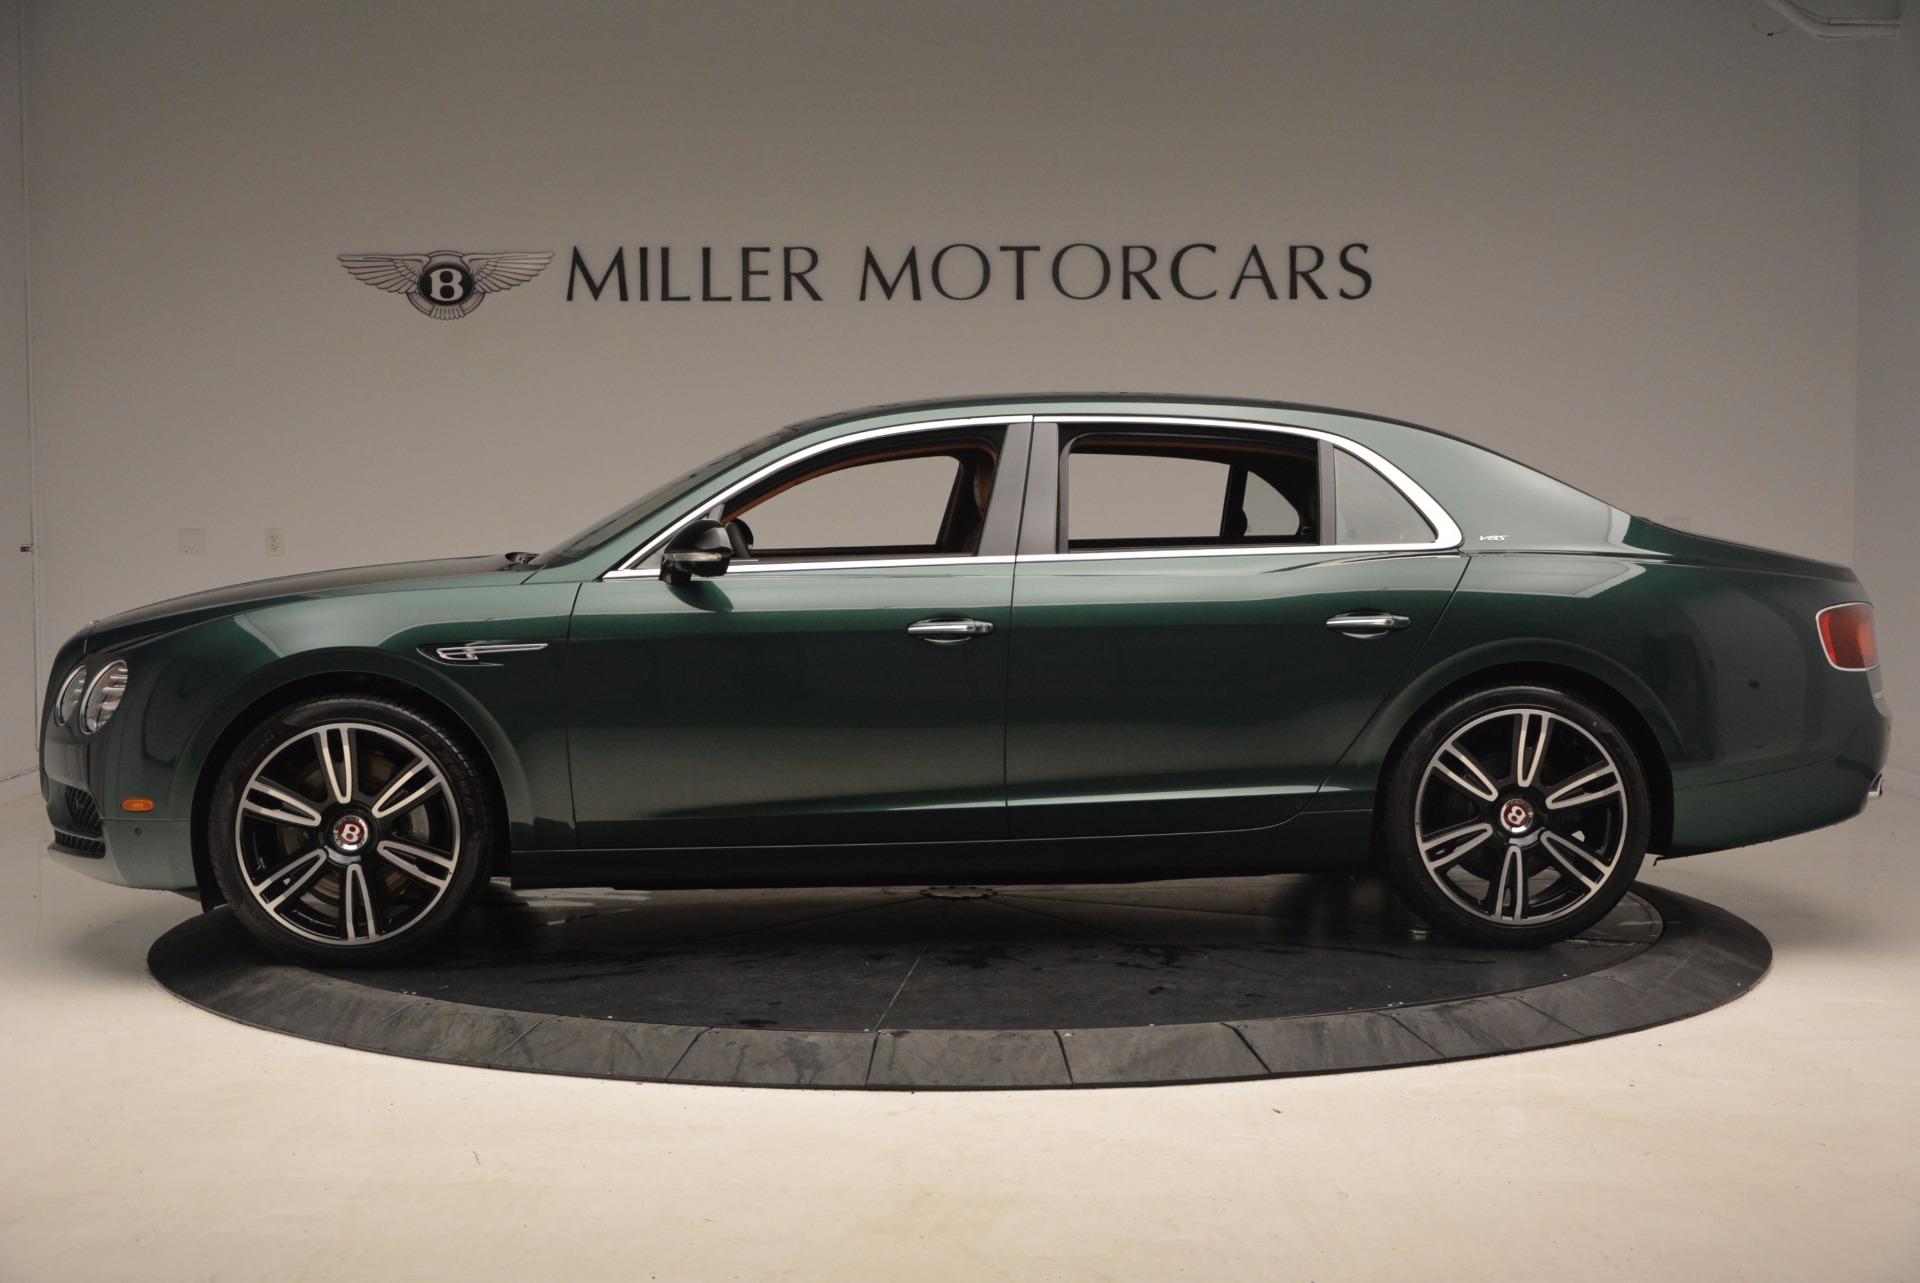 New 2017 Bentley Flying Spur V8 S For Sale In Westport, CT 1471_p3